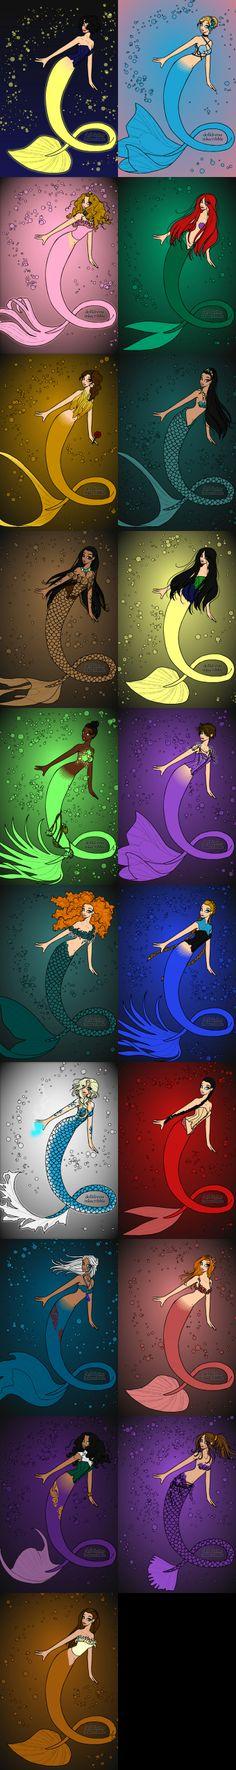 All Disney Princesses as Mermaids | Disney Princess As Mermaids: Redone by Ka1236